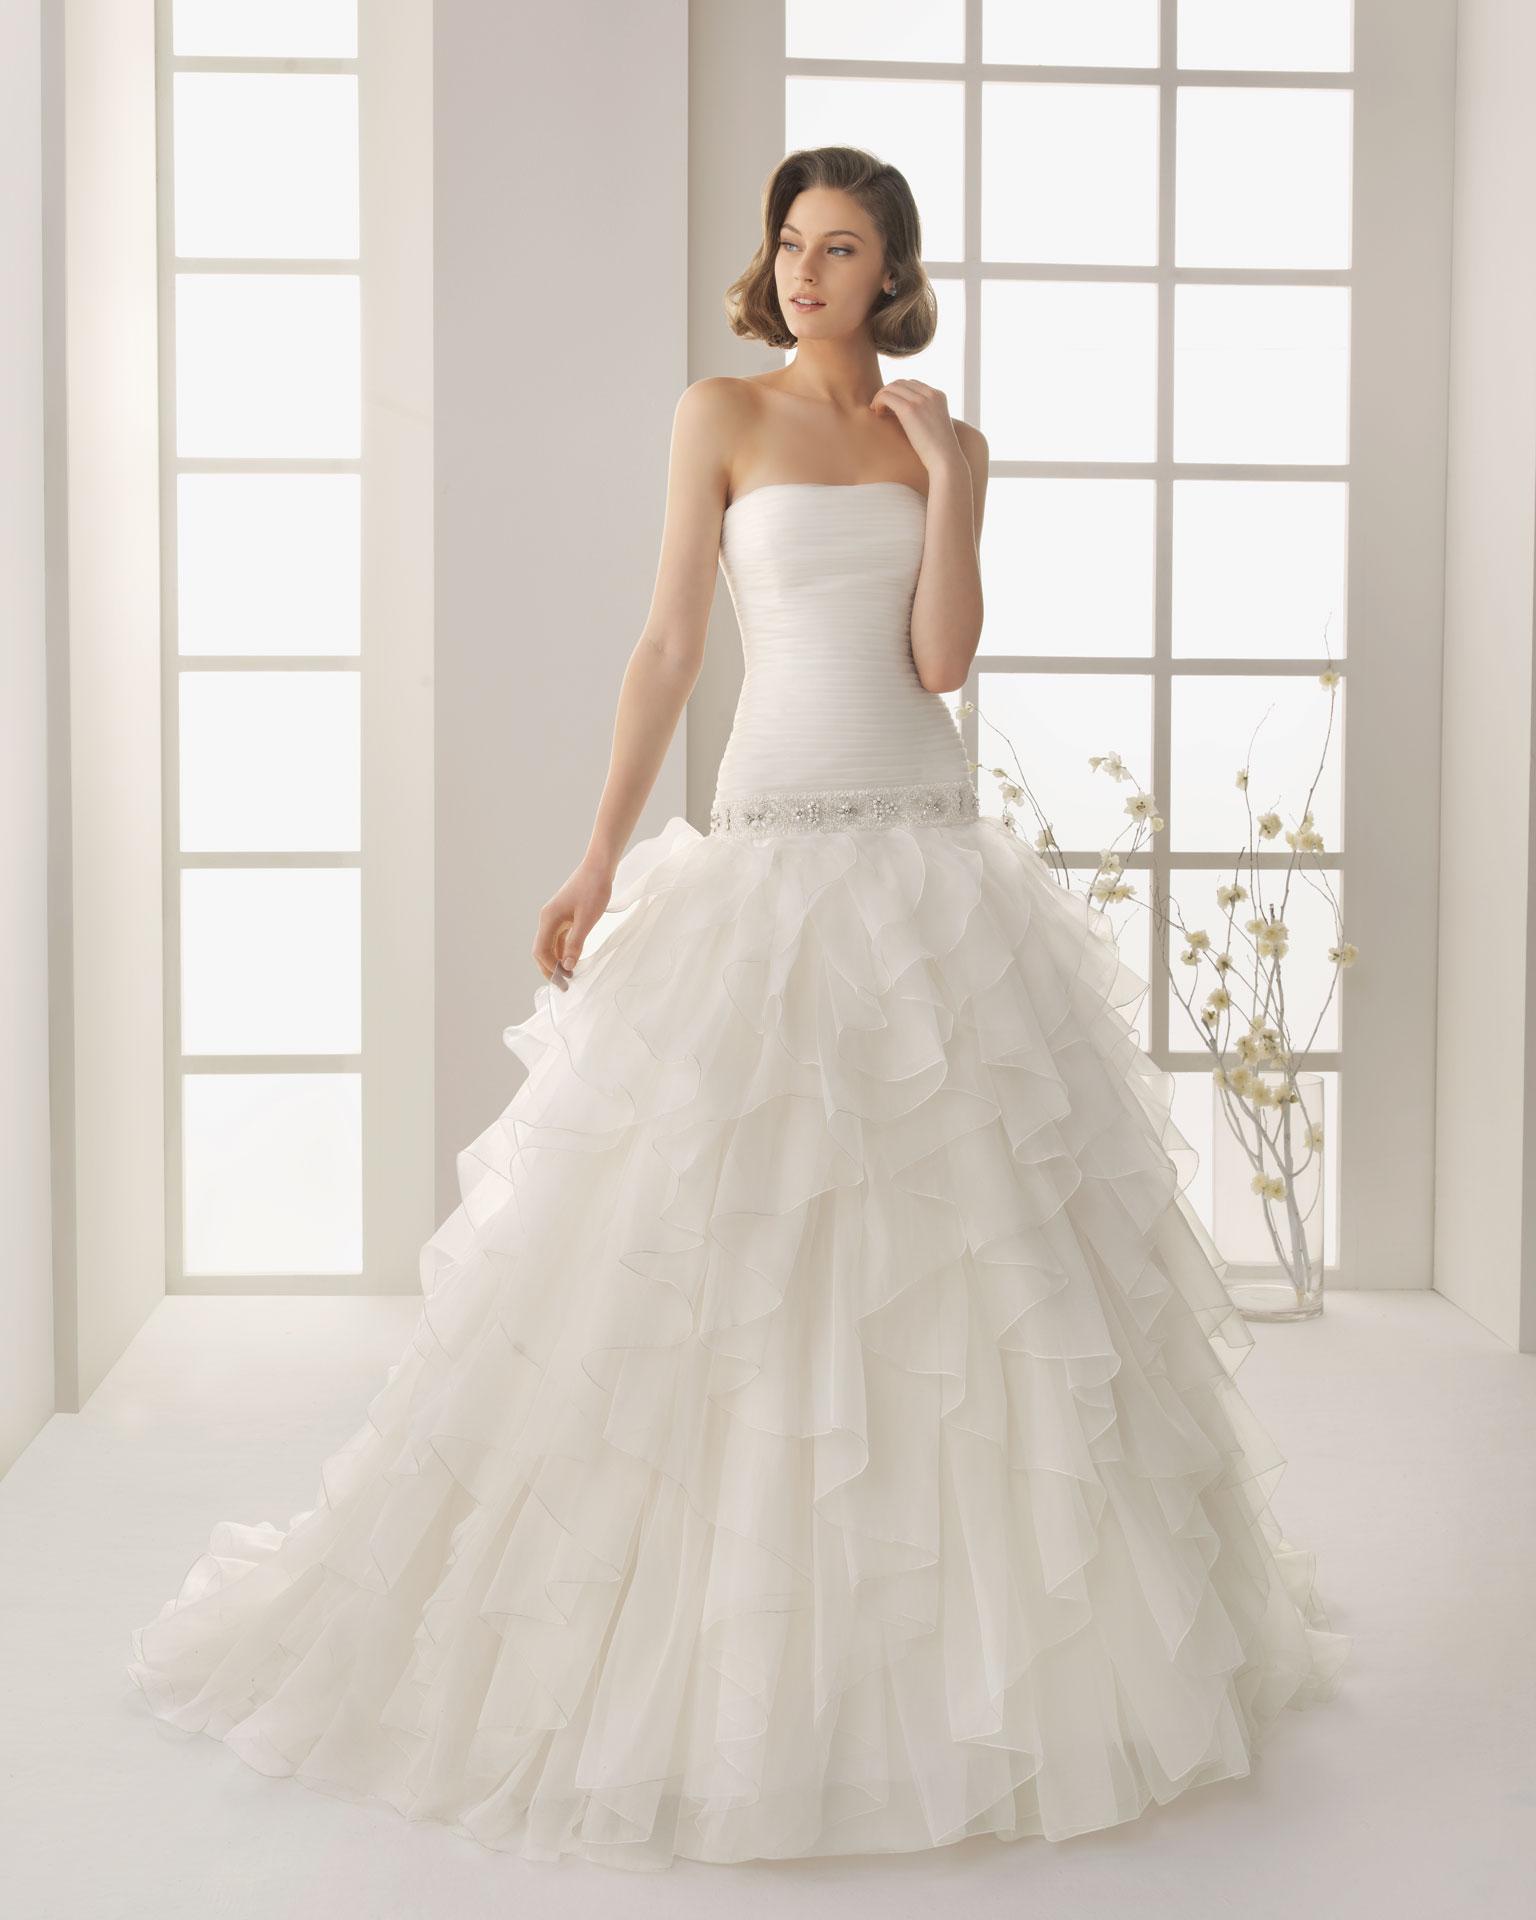 69f763ae4 vestido de novia two 157 2 GRANDE